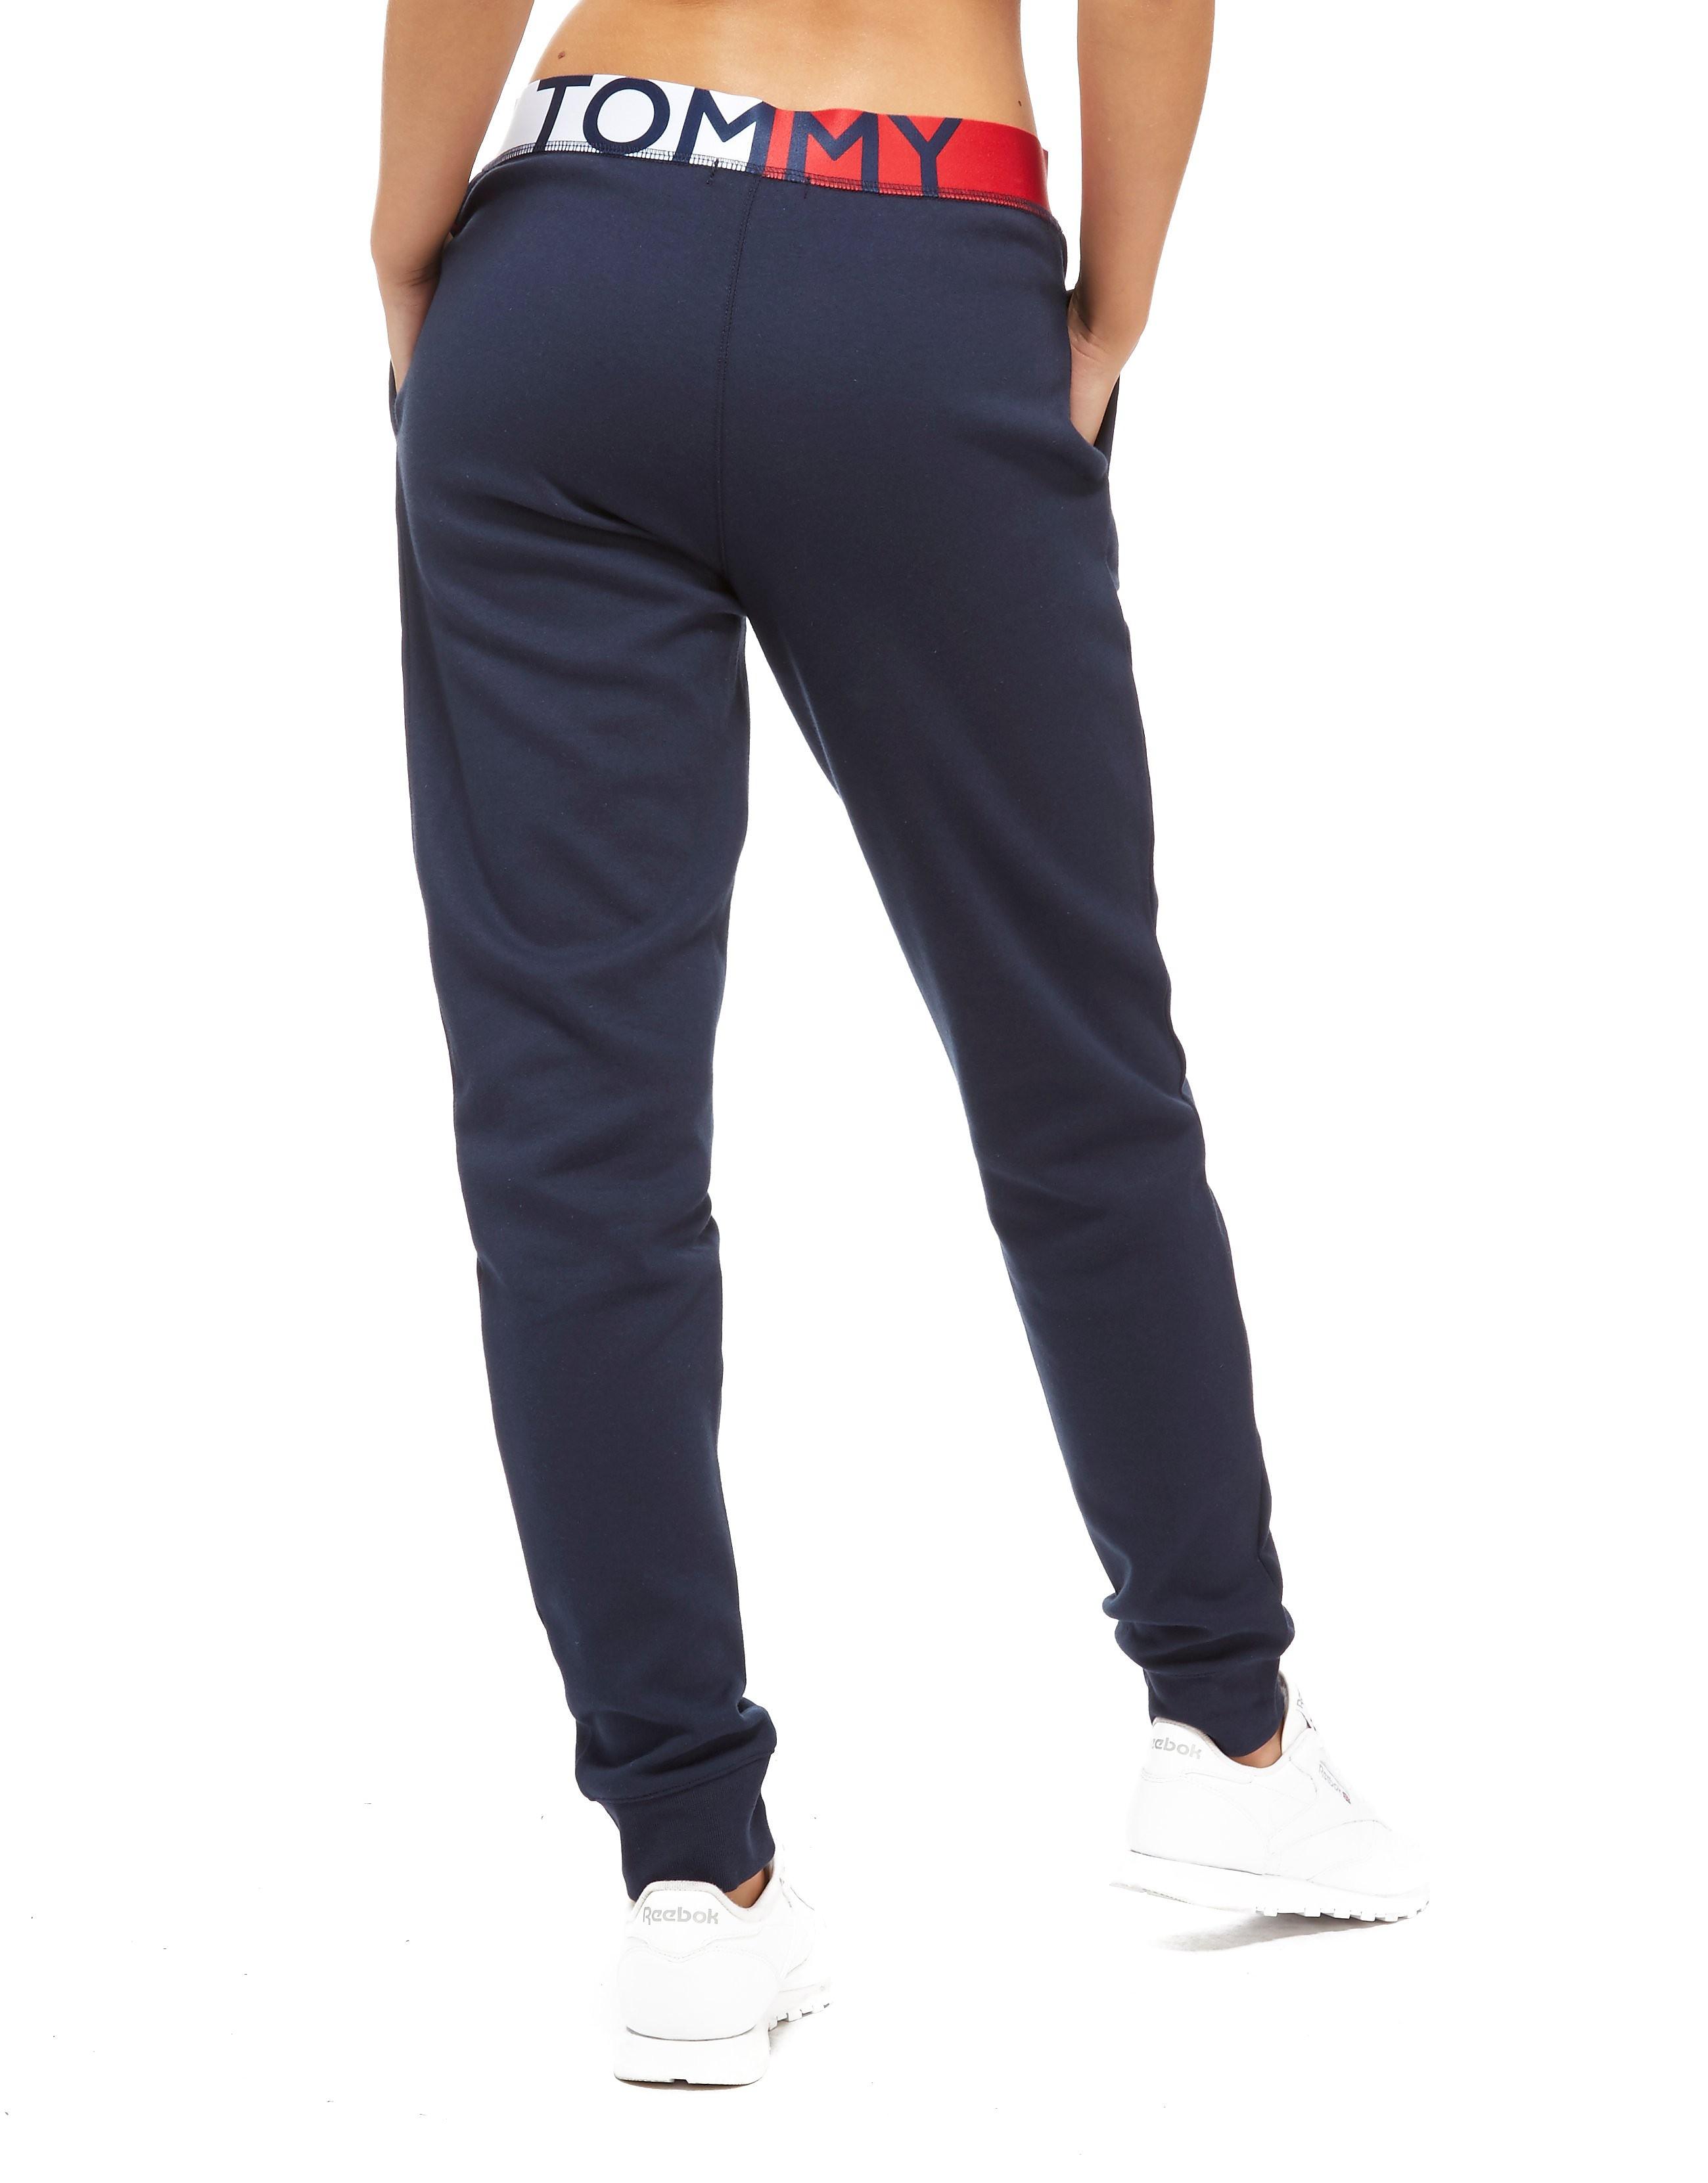 Tommy Hilfiger Tape Pants